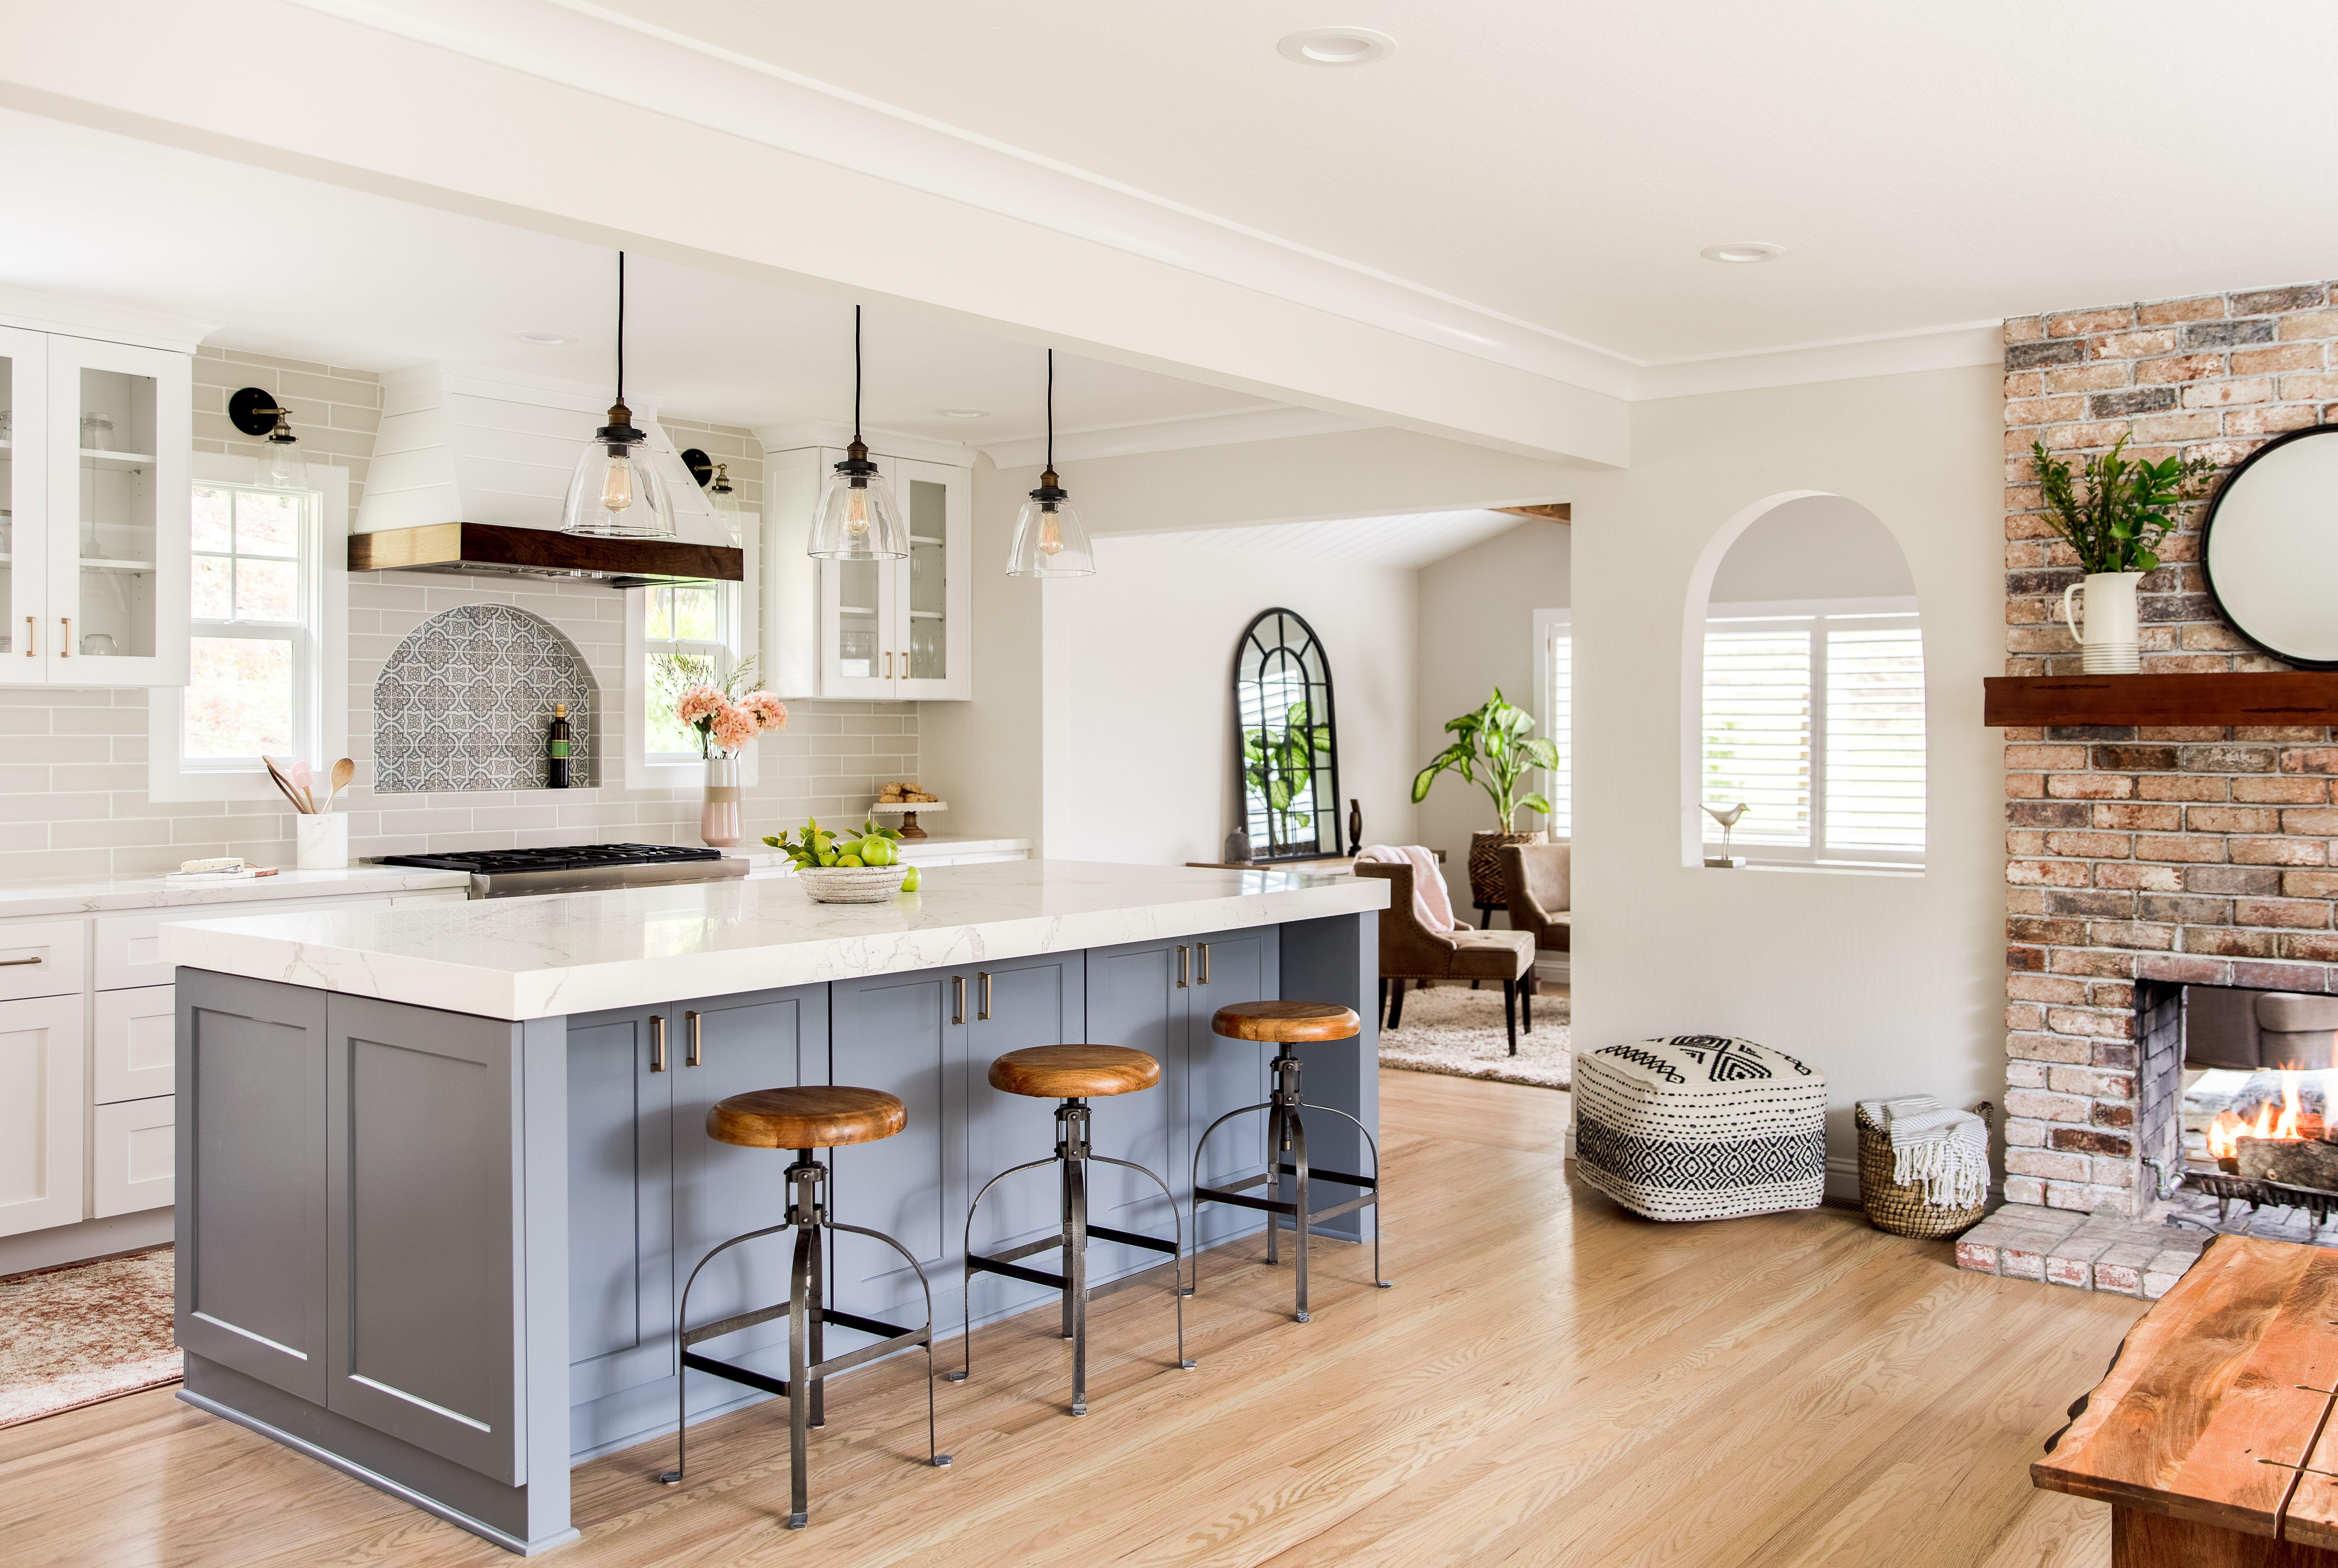 Modern Farmhouse, blue kitchen island, pendants, light